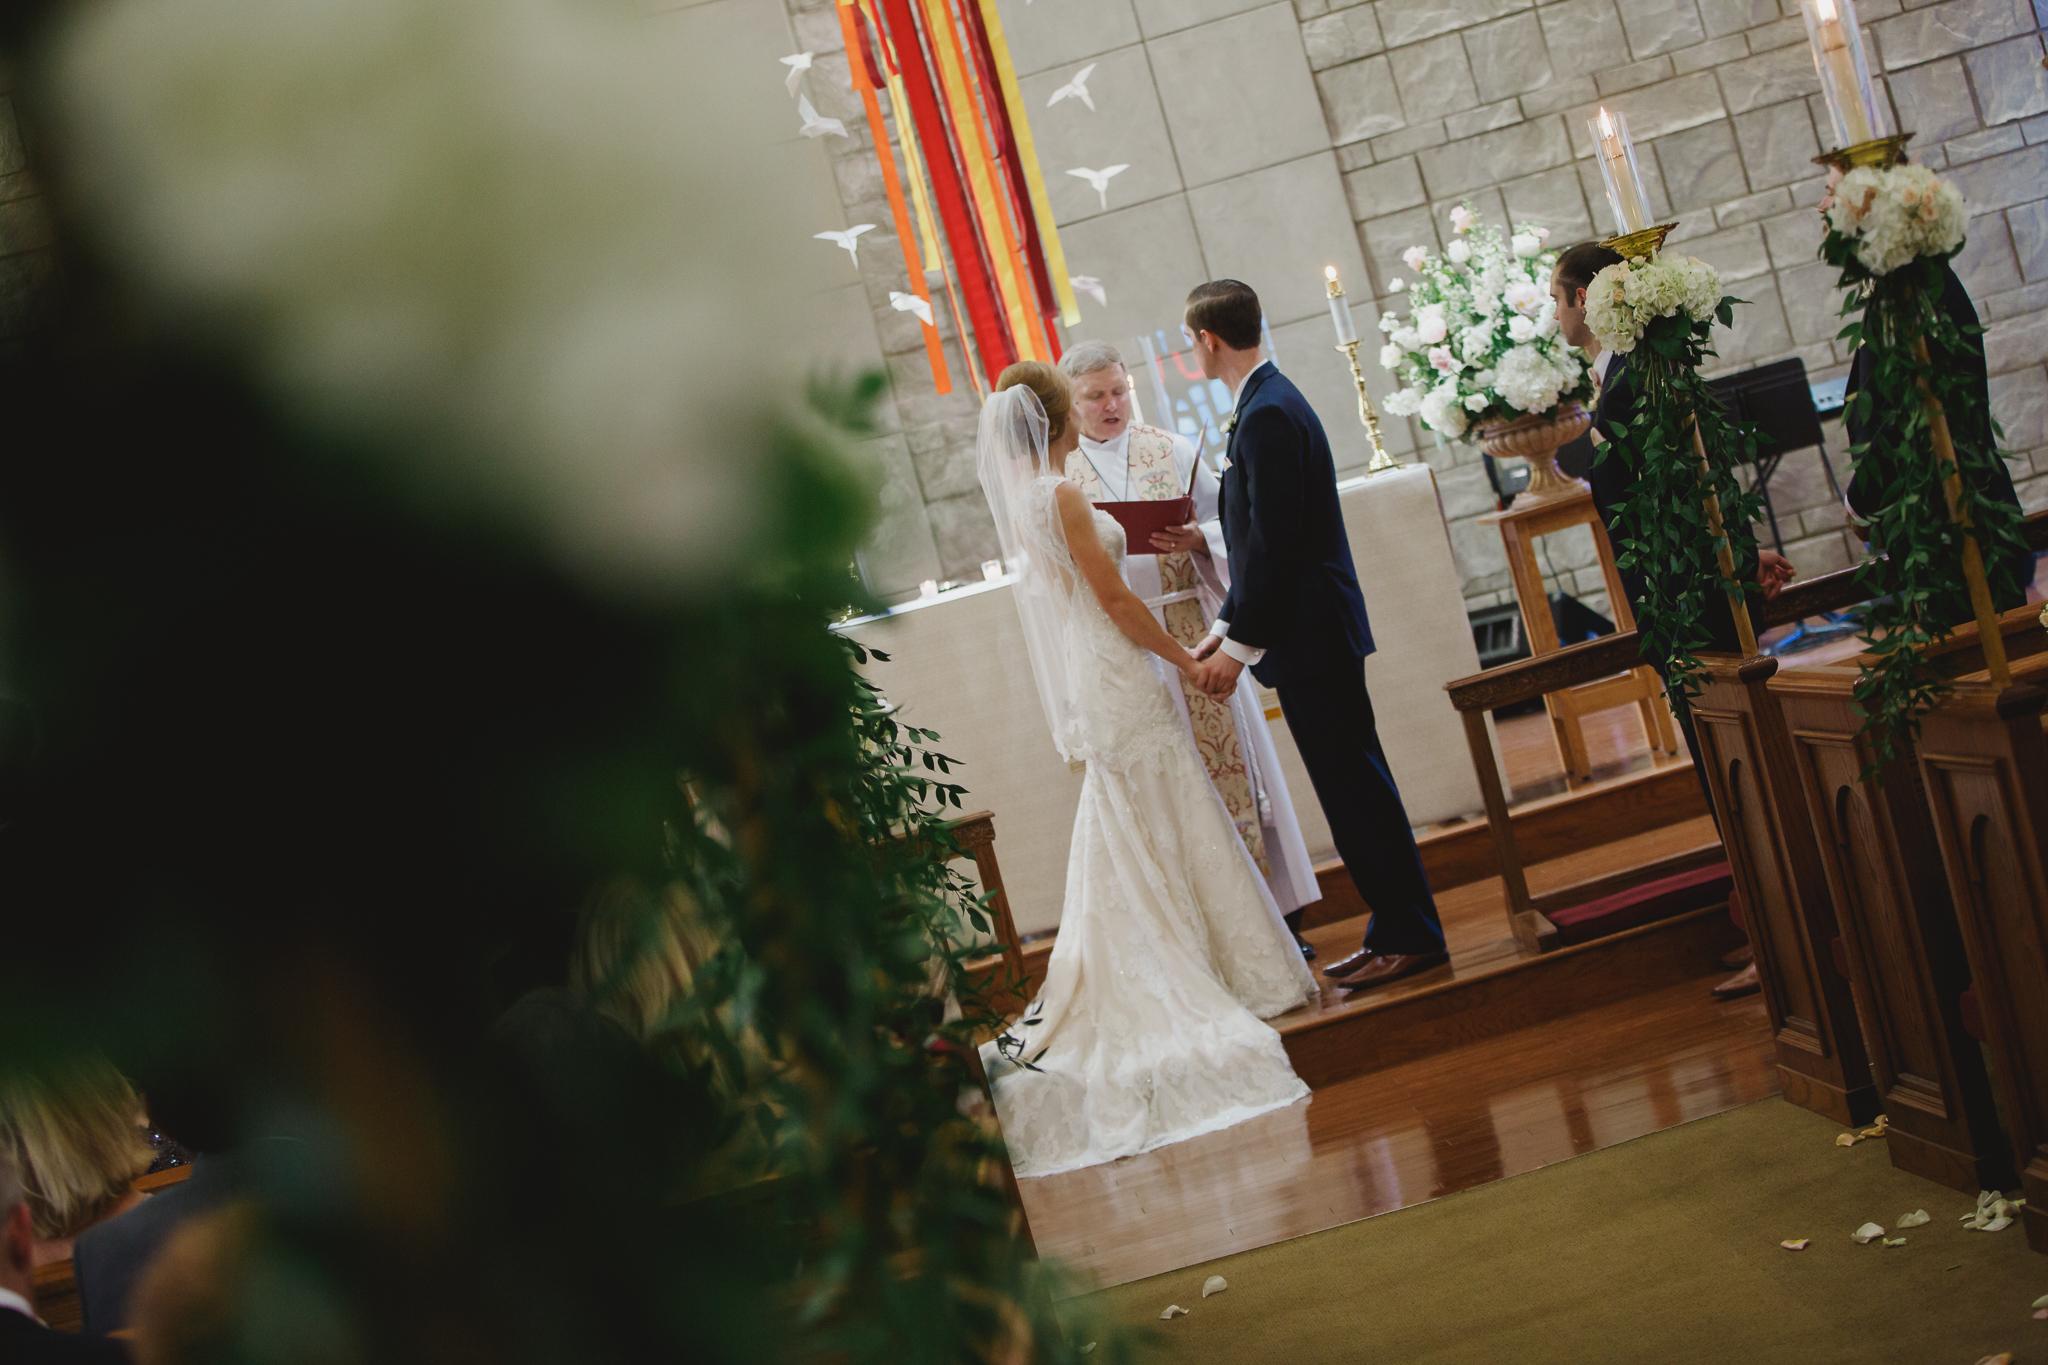 Michael and Kelly - the ashton depot - wedding DFW - wedding photographer- elizalde photography (36 of 150).jpg